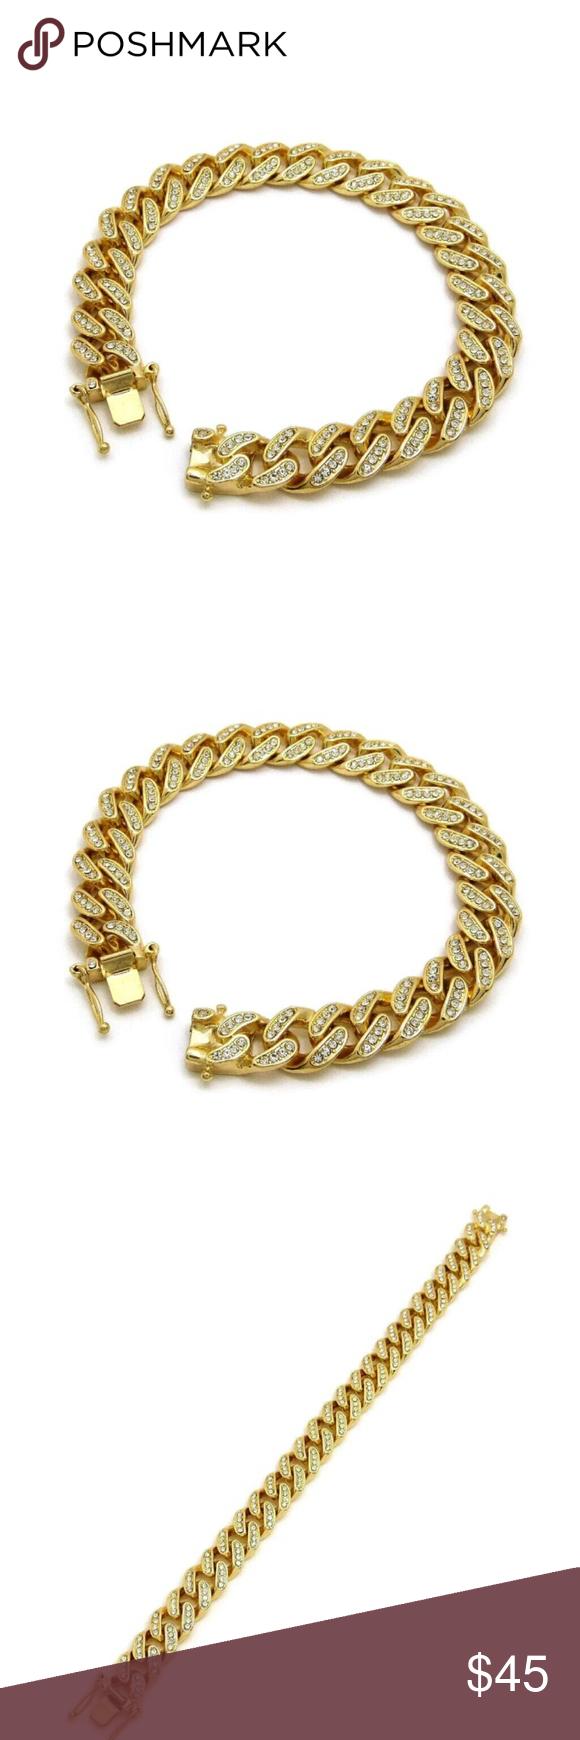 K gold plated luxury miami cuban bracelet hip hop fashion bling